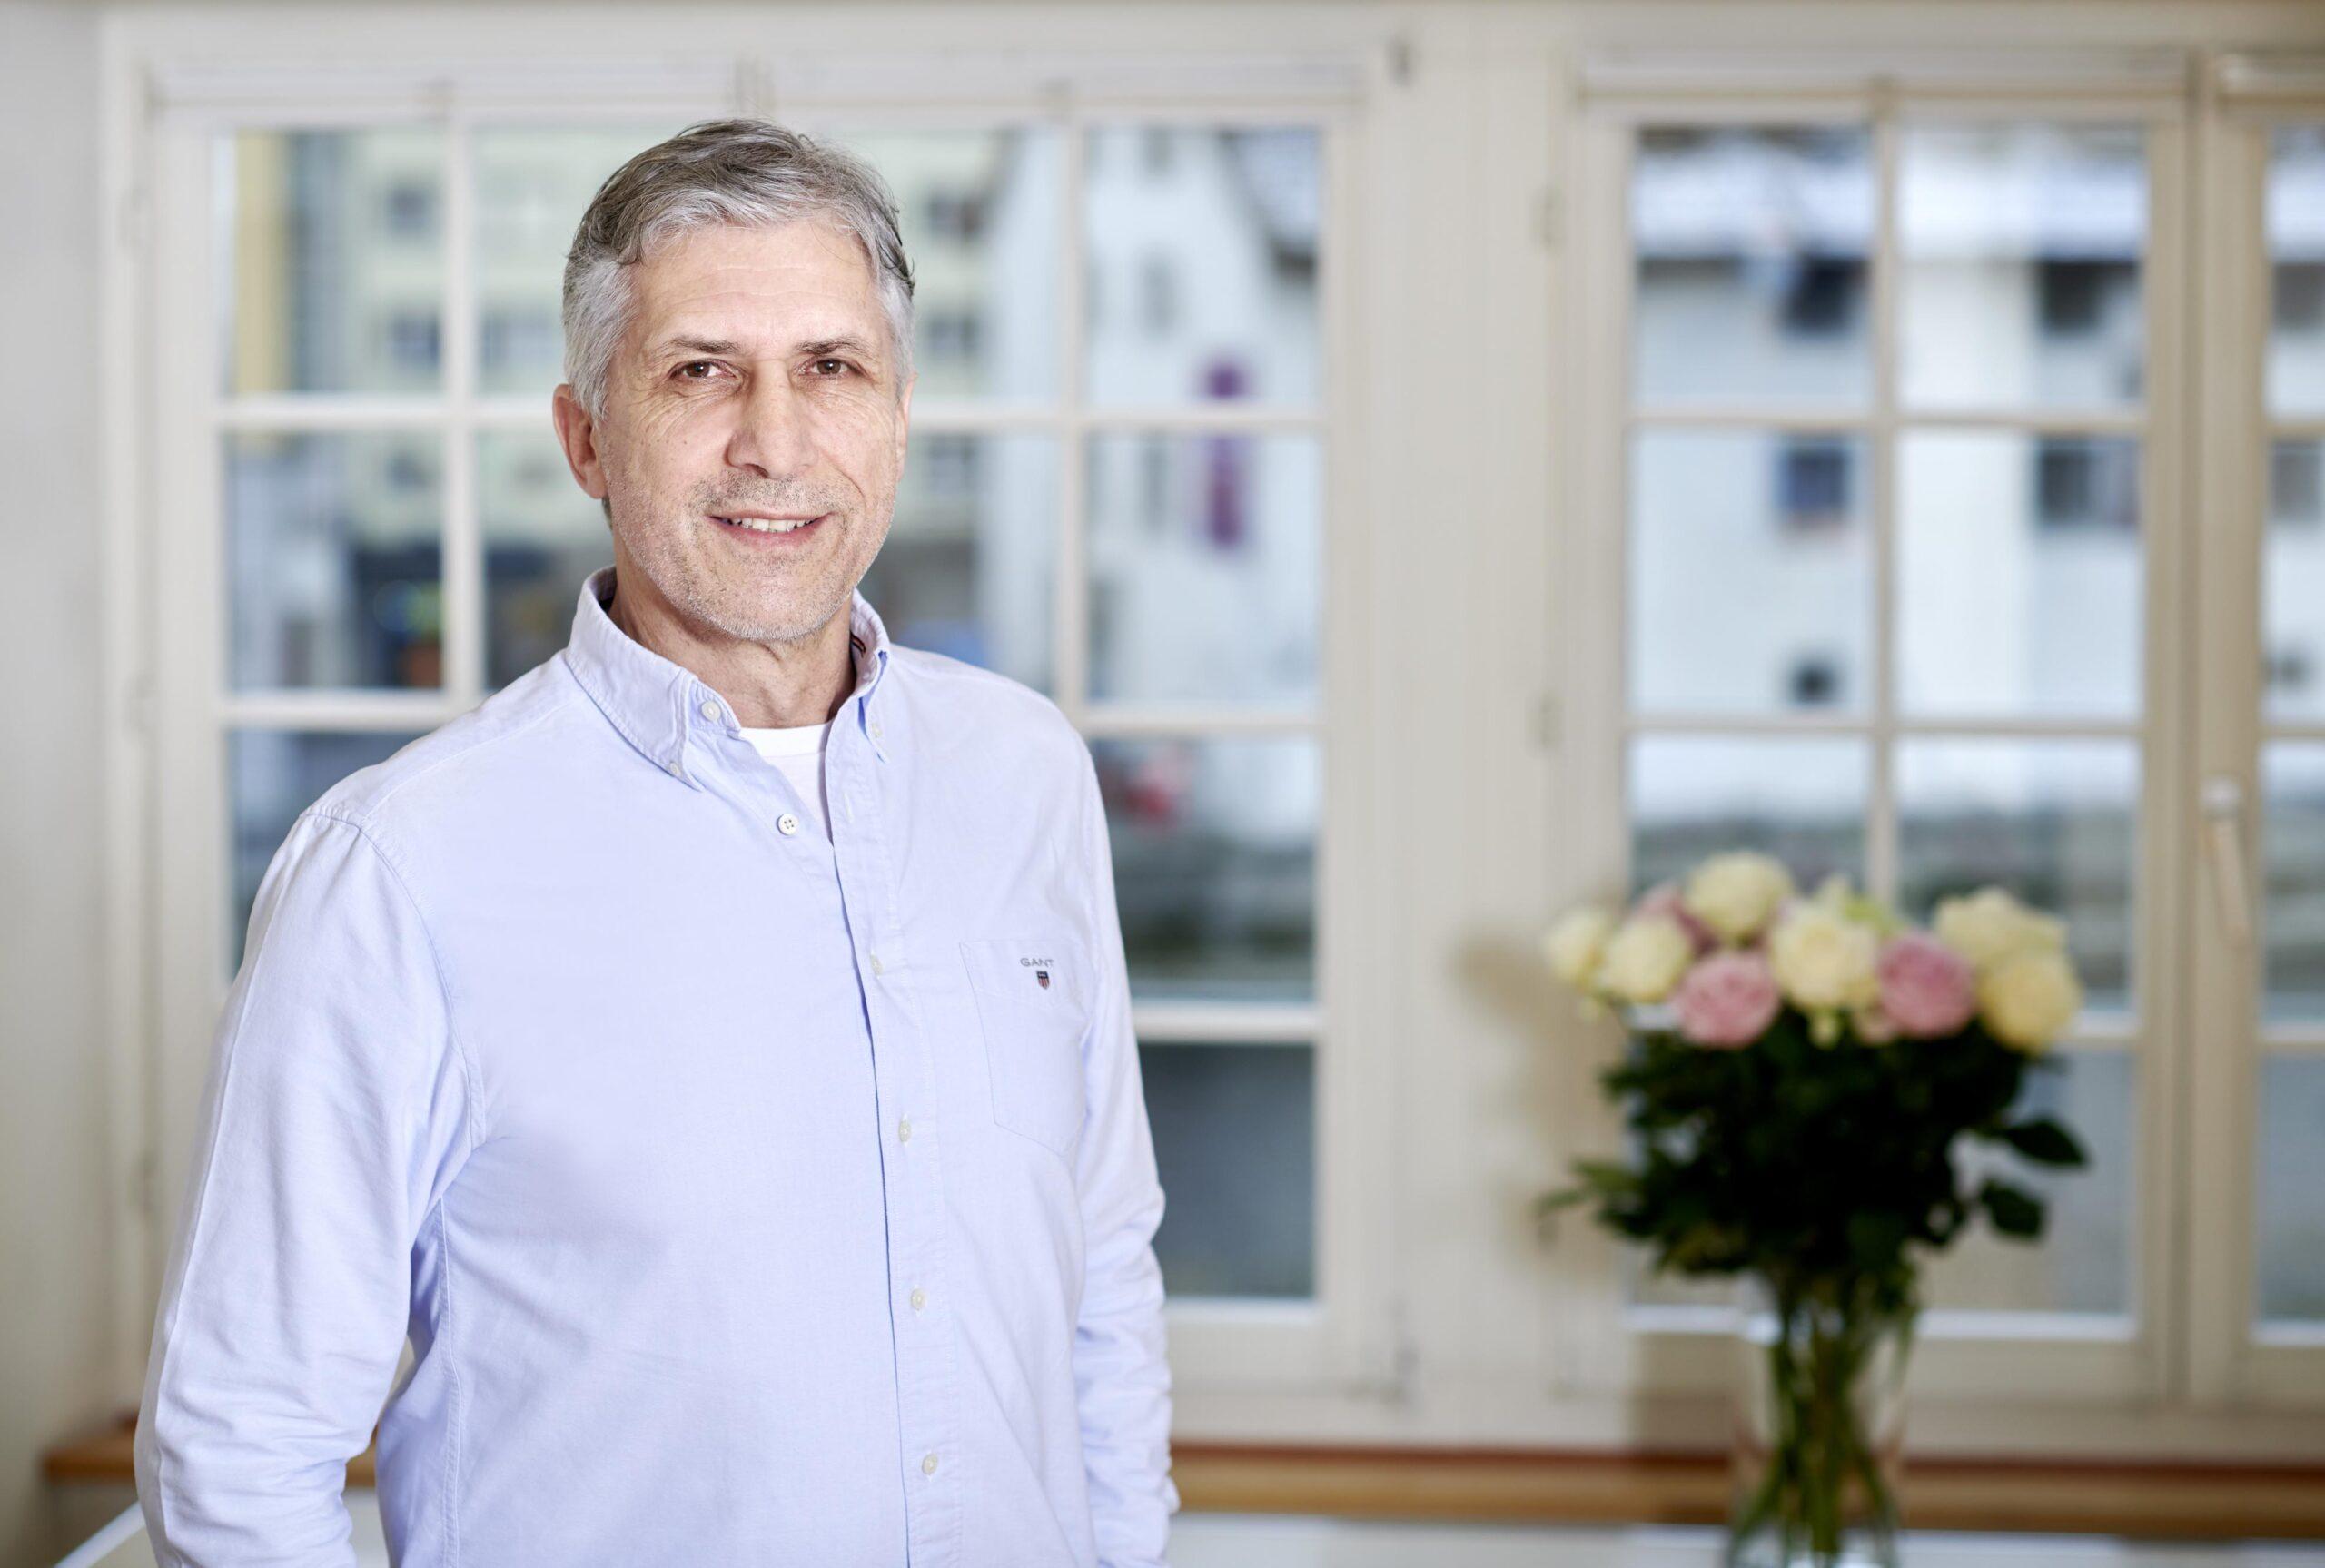 Frauenarzt Dr. med. Marco Steiner